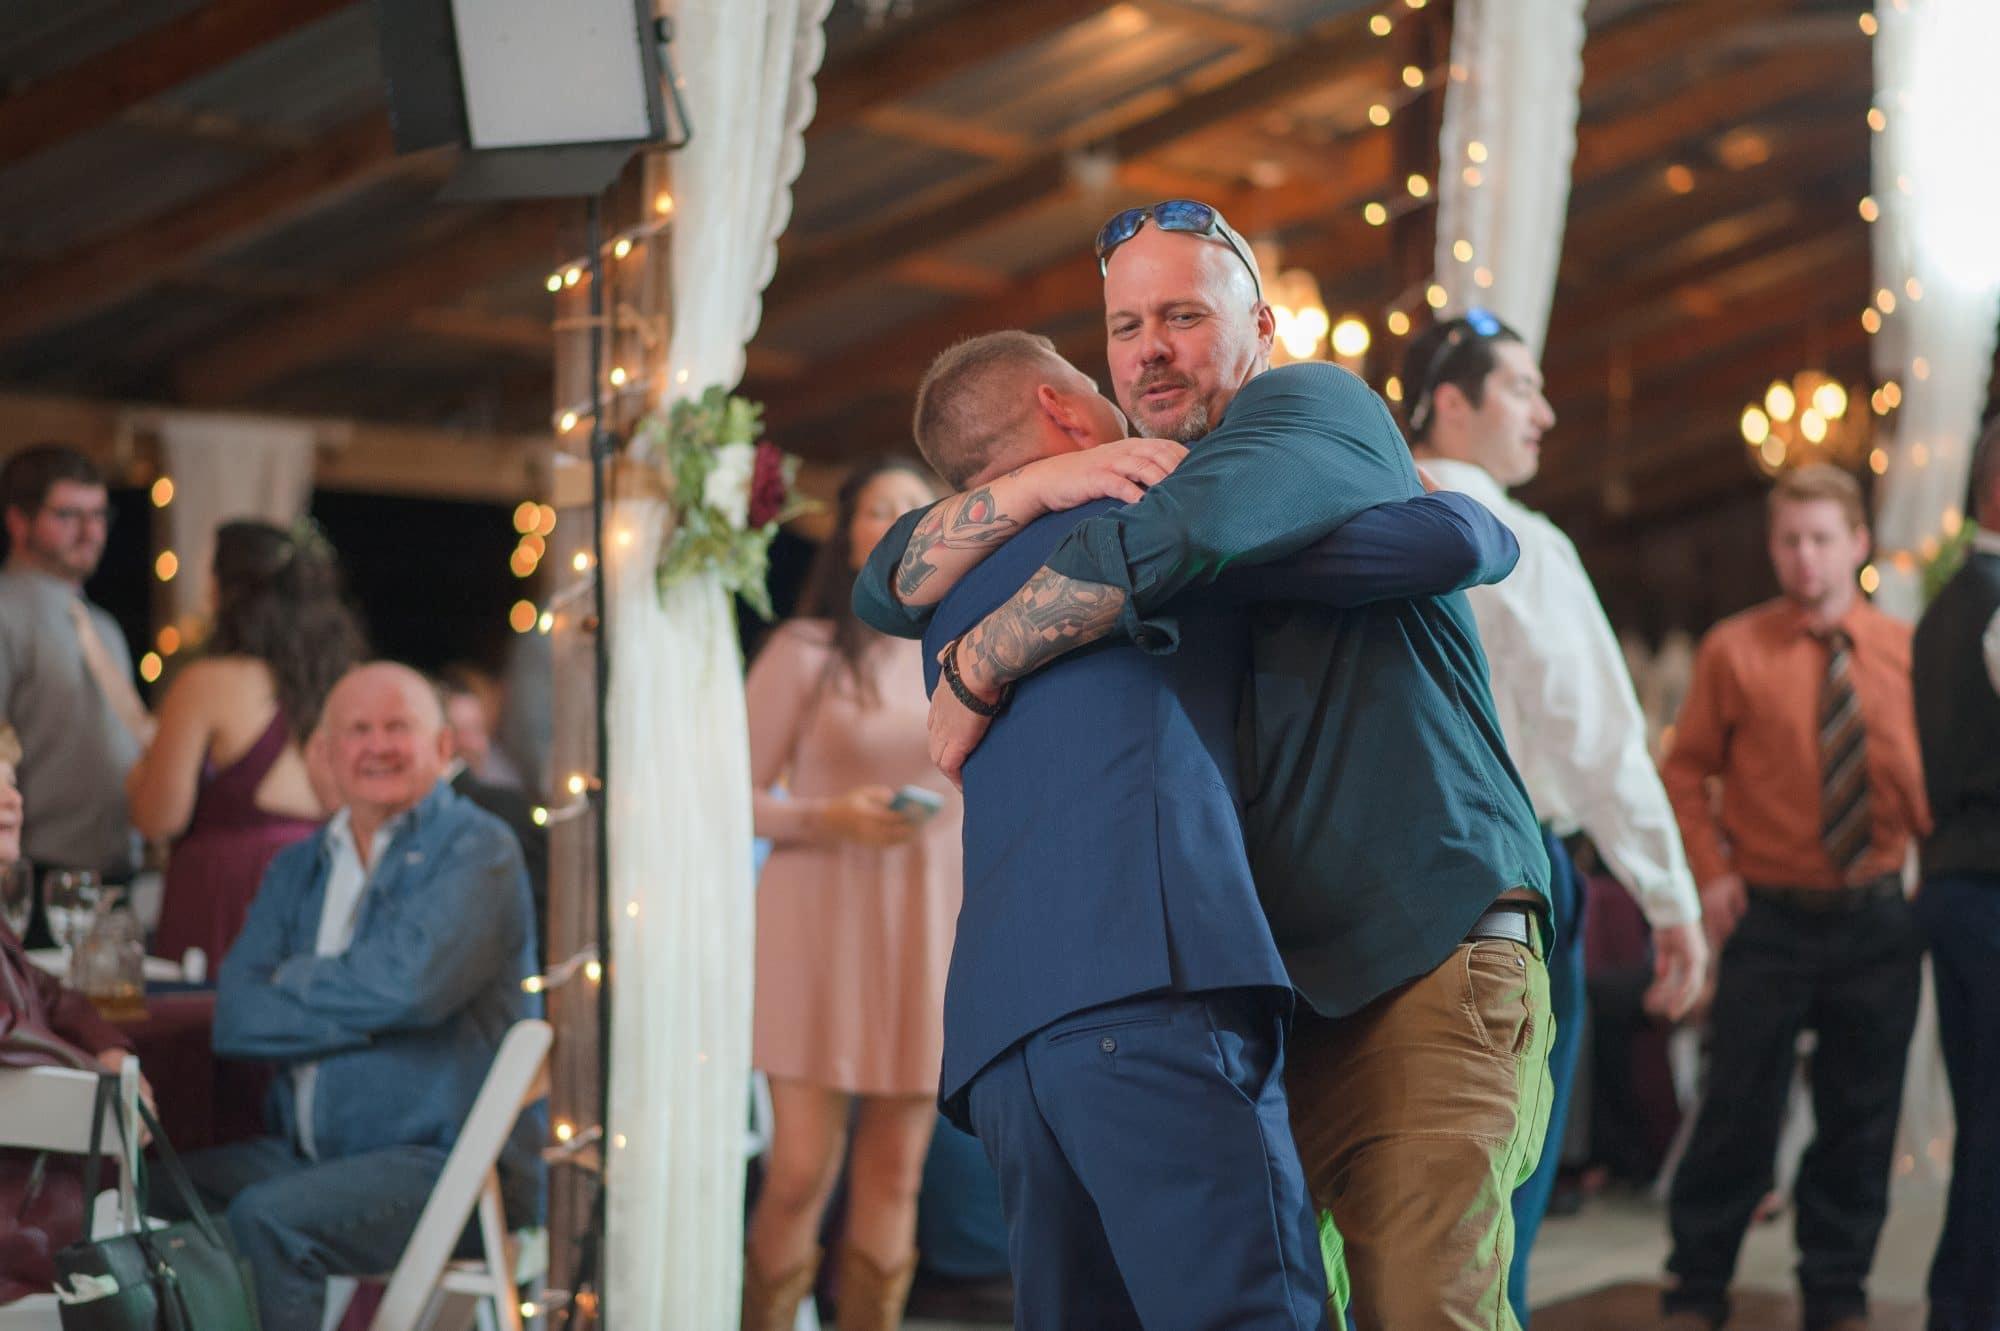 Todd hugging wedding guest.